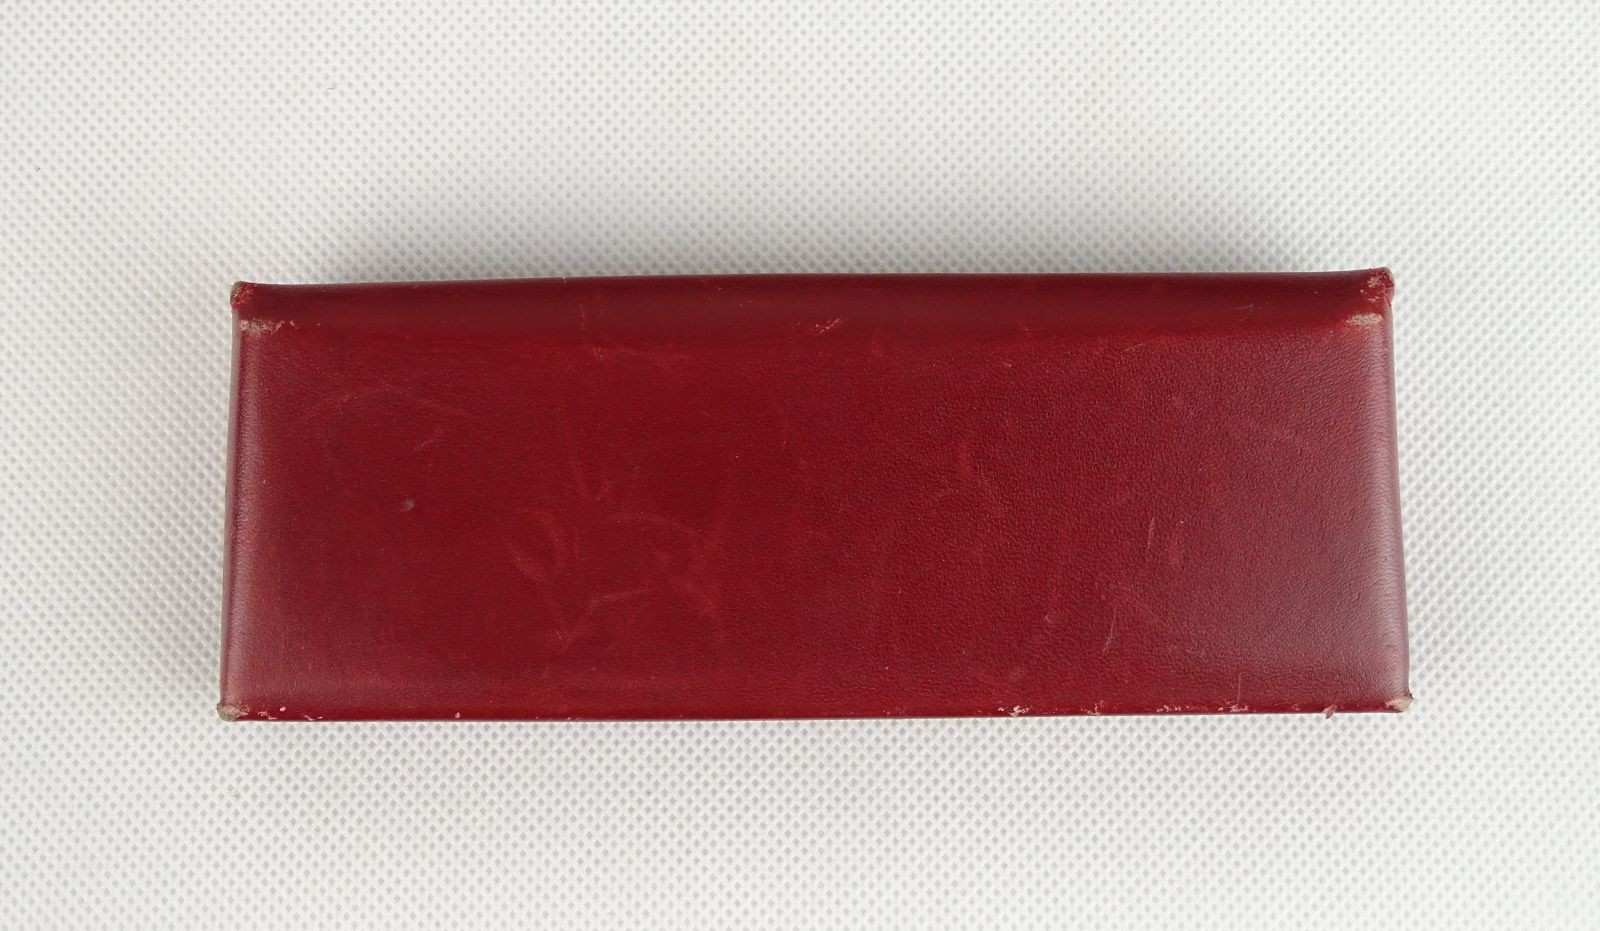 DSC05435.JPG (1600×931)